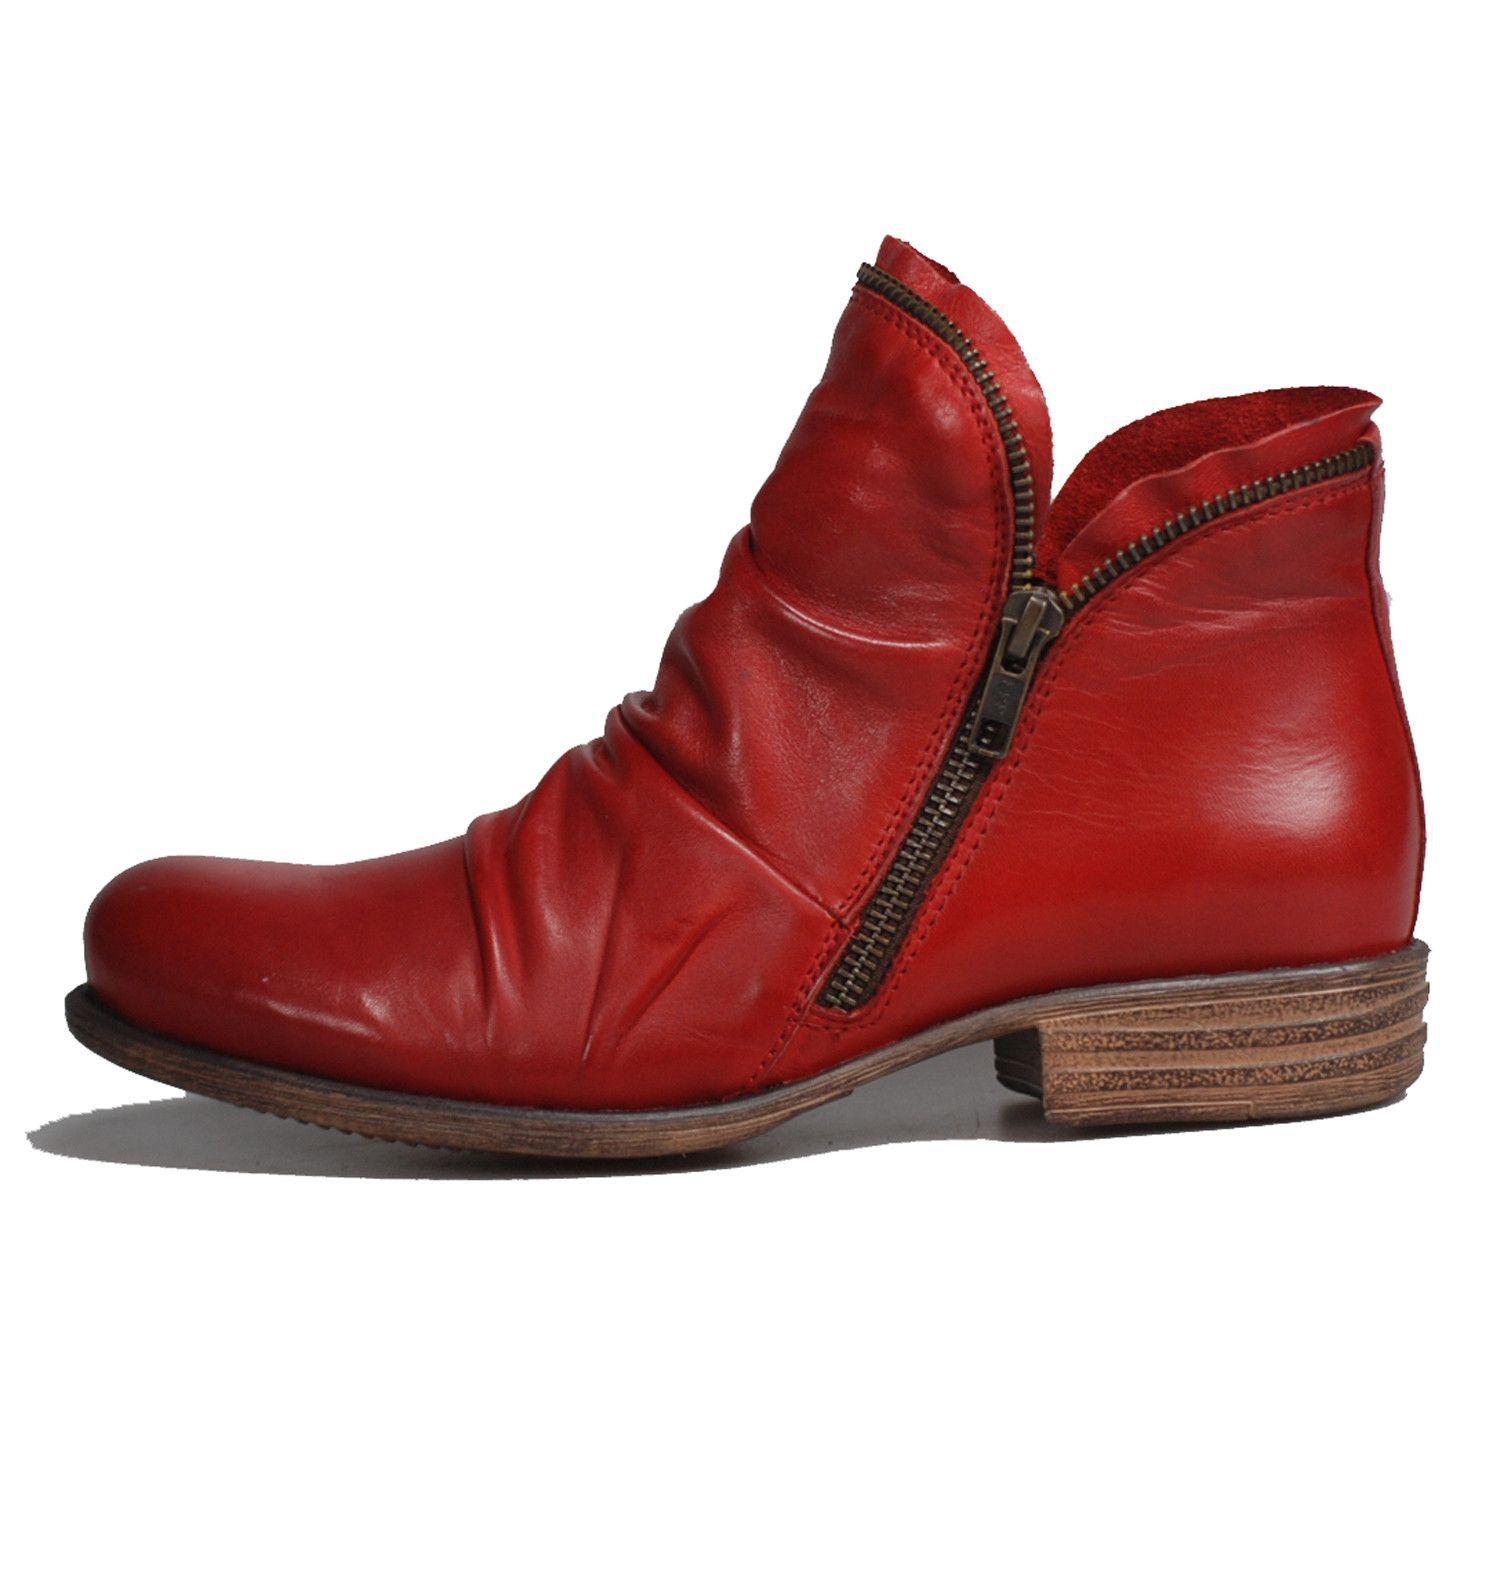 Miz Mooz Luna Red Flat Leather Boots Miz Mooz Boots Shoe Boots